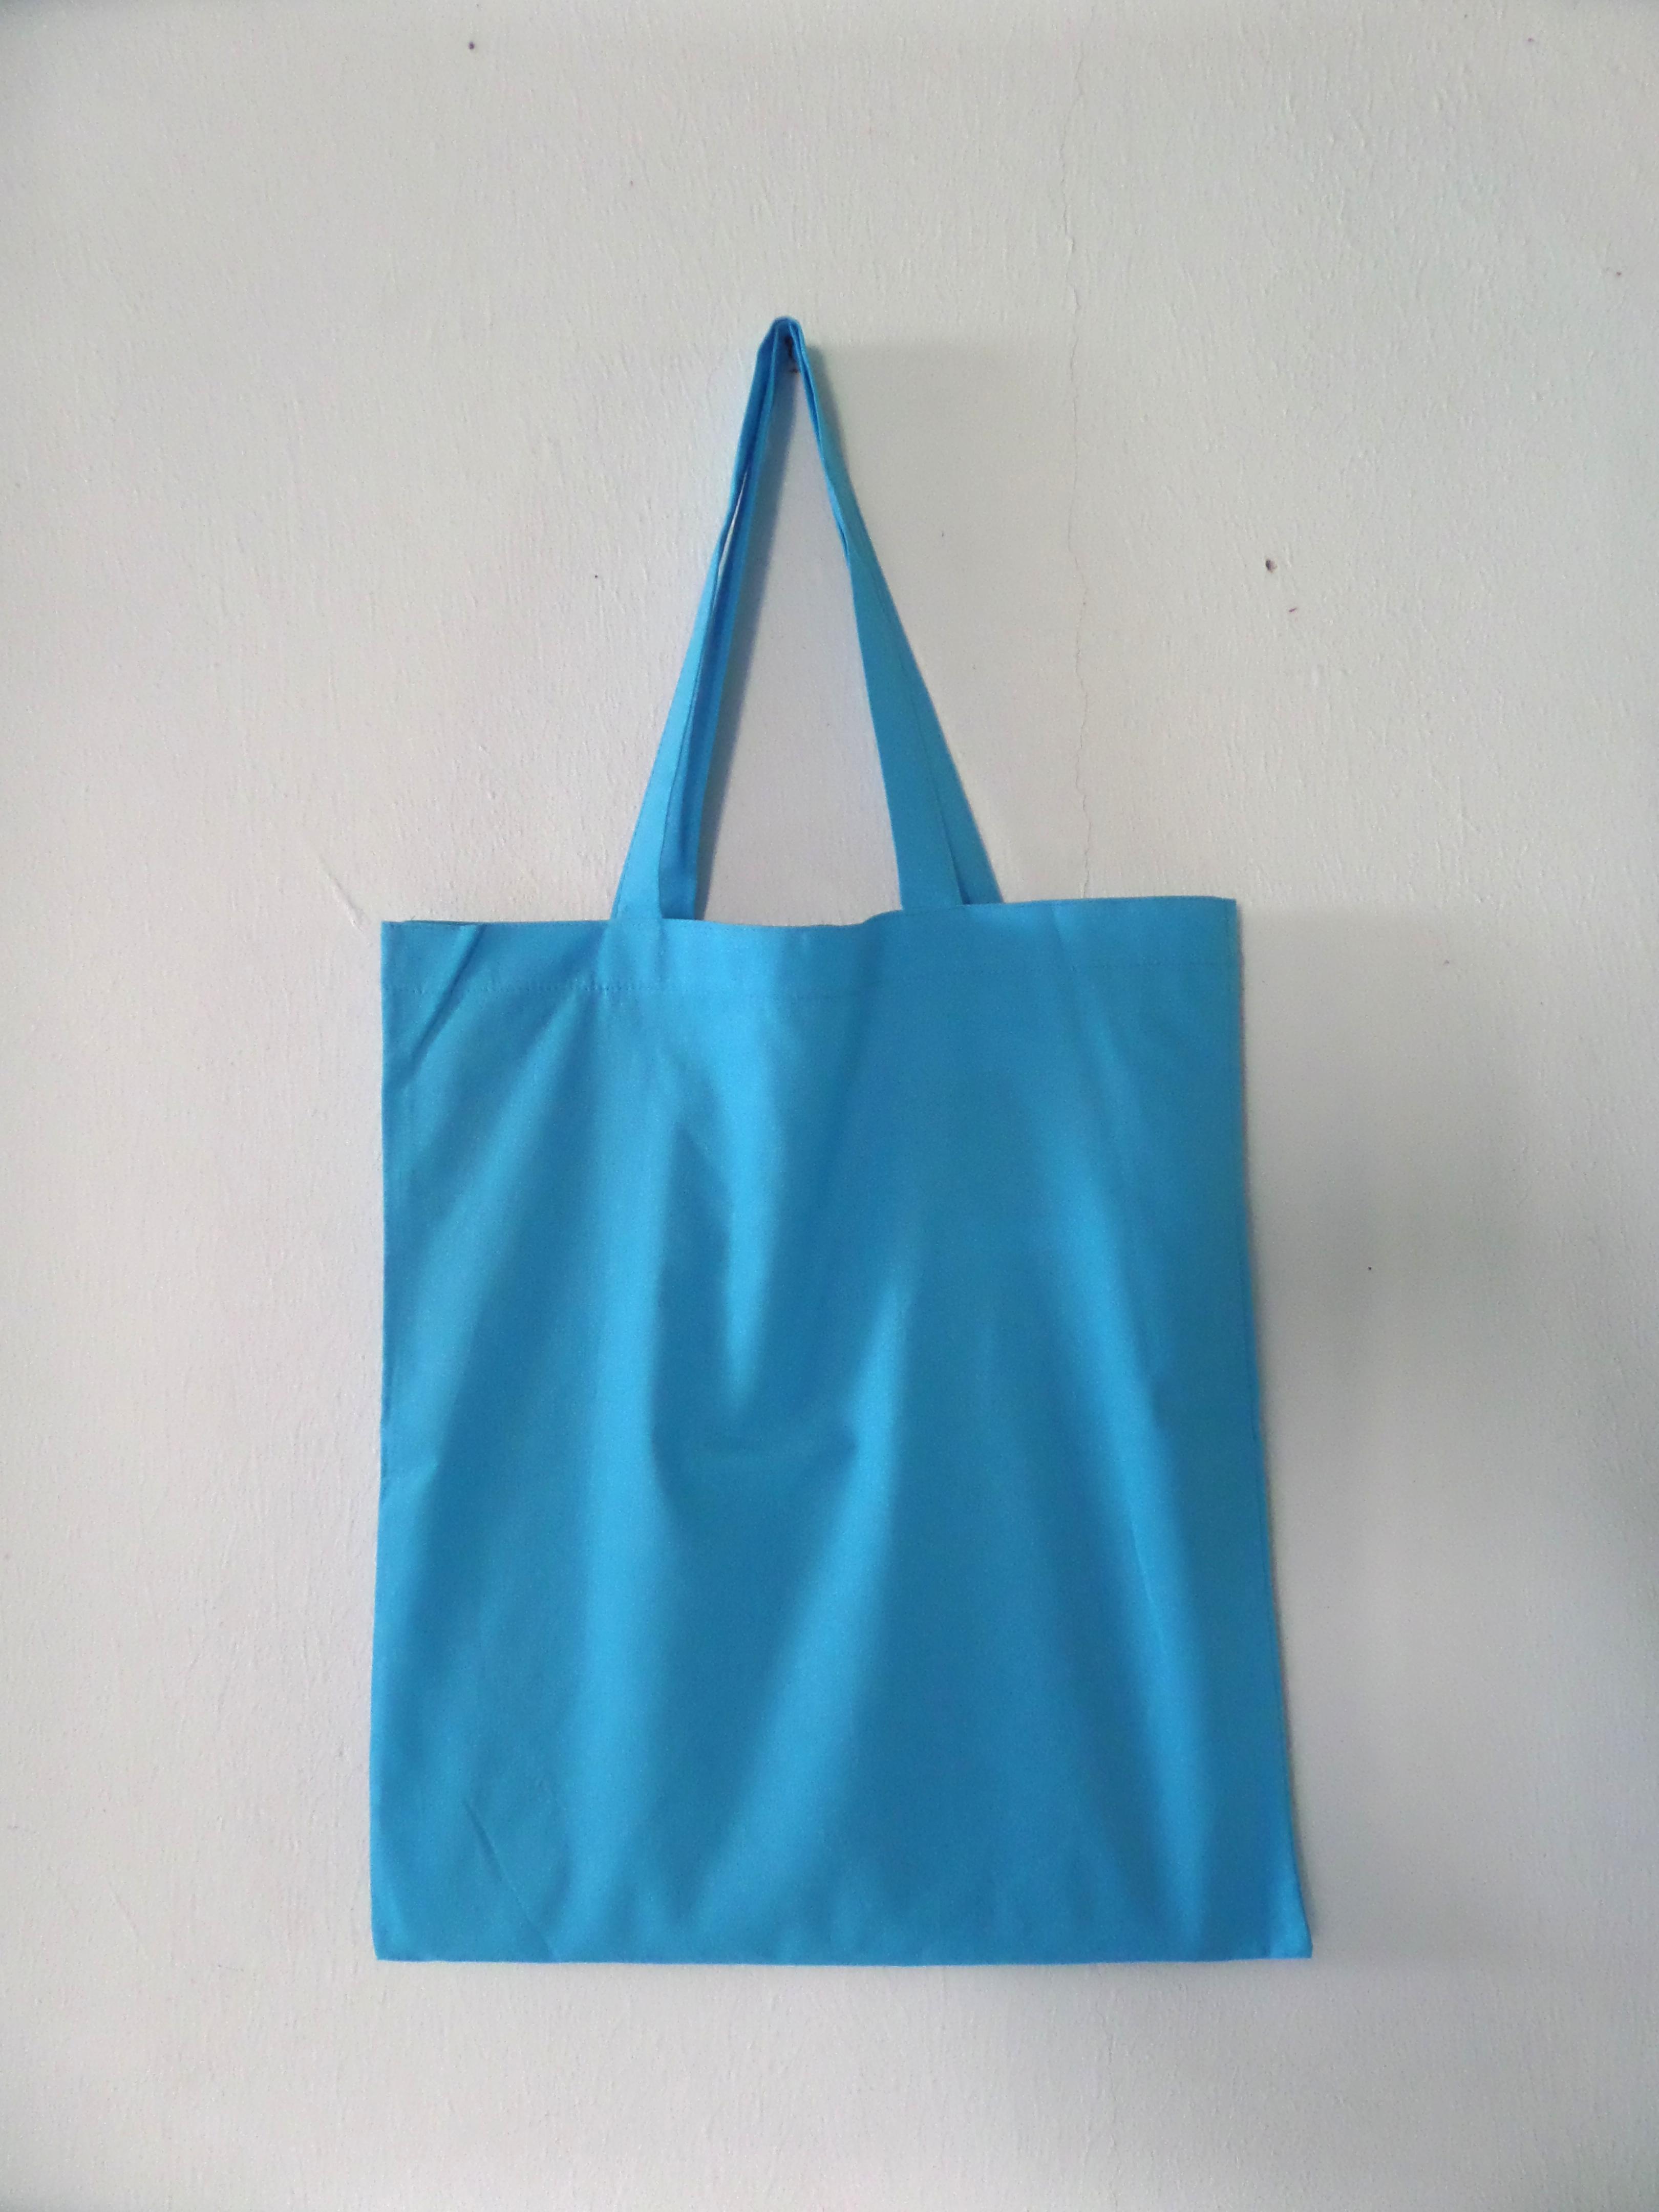 CODE: BL05   (Cotton A3 size Blue Tote Bag)